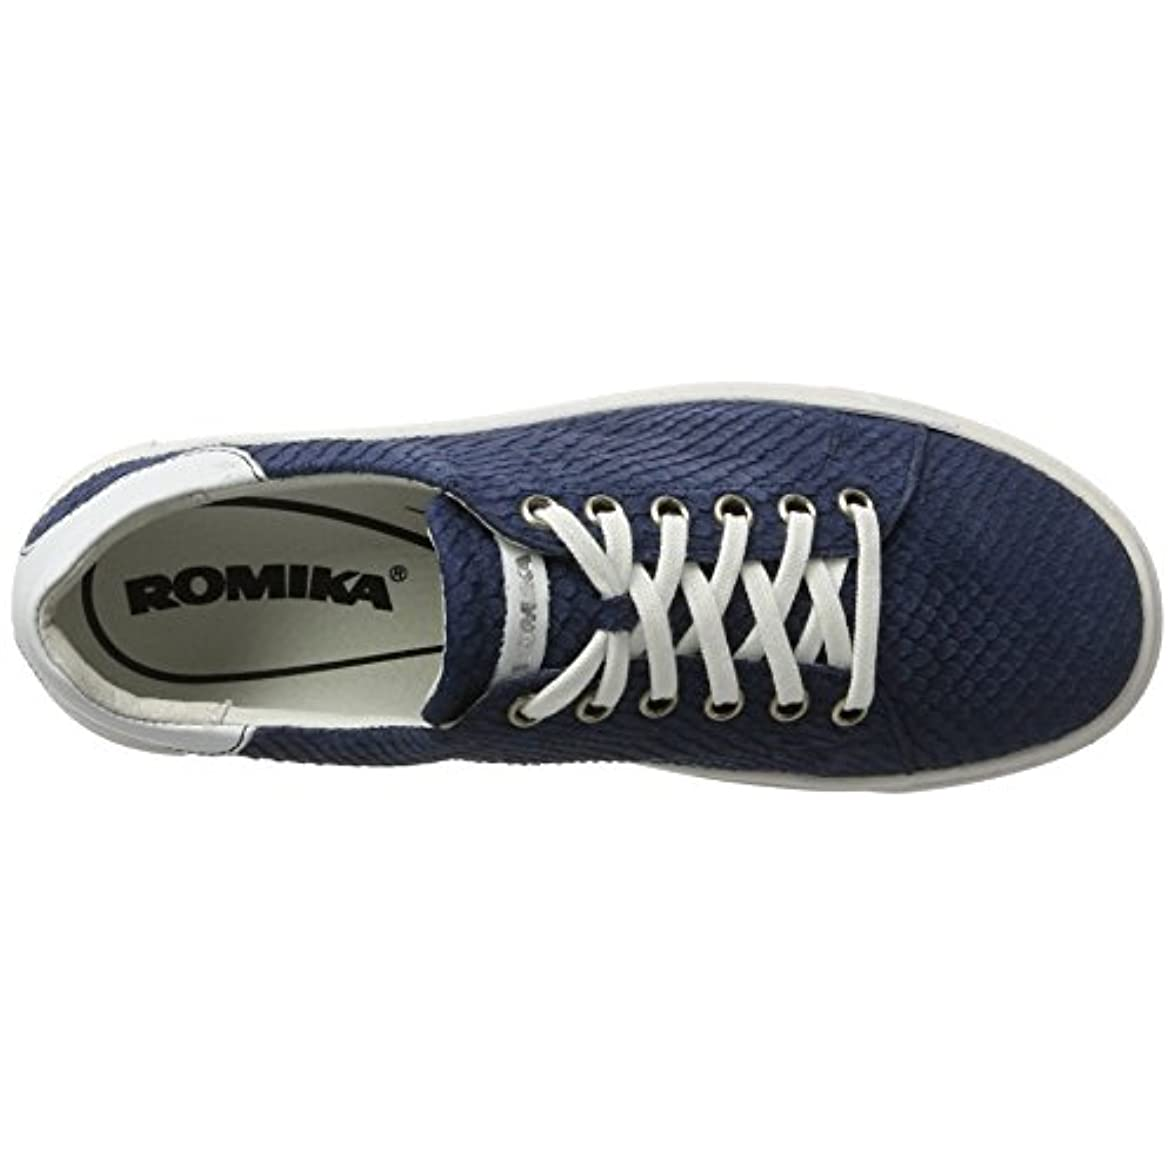 Romika 36302 56 Scarpe Da Ginnastica Basse Donna